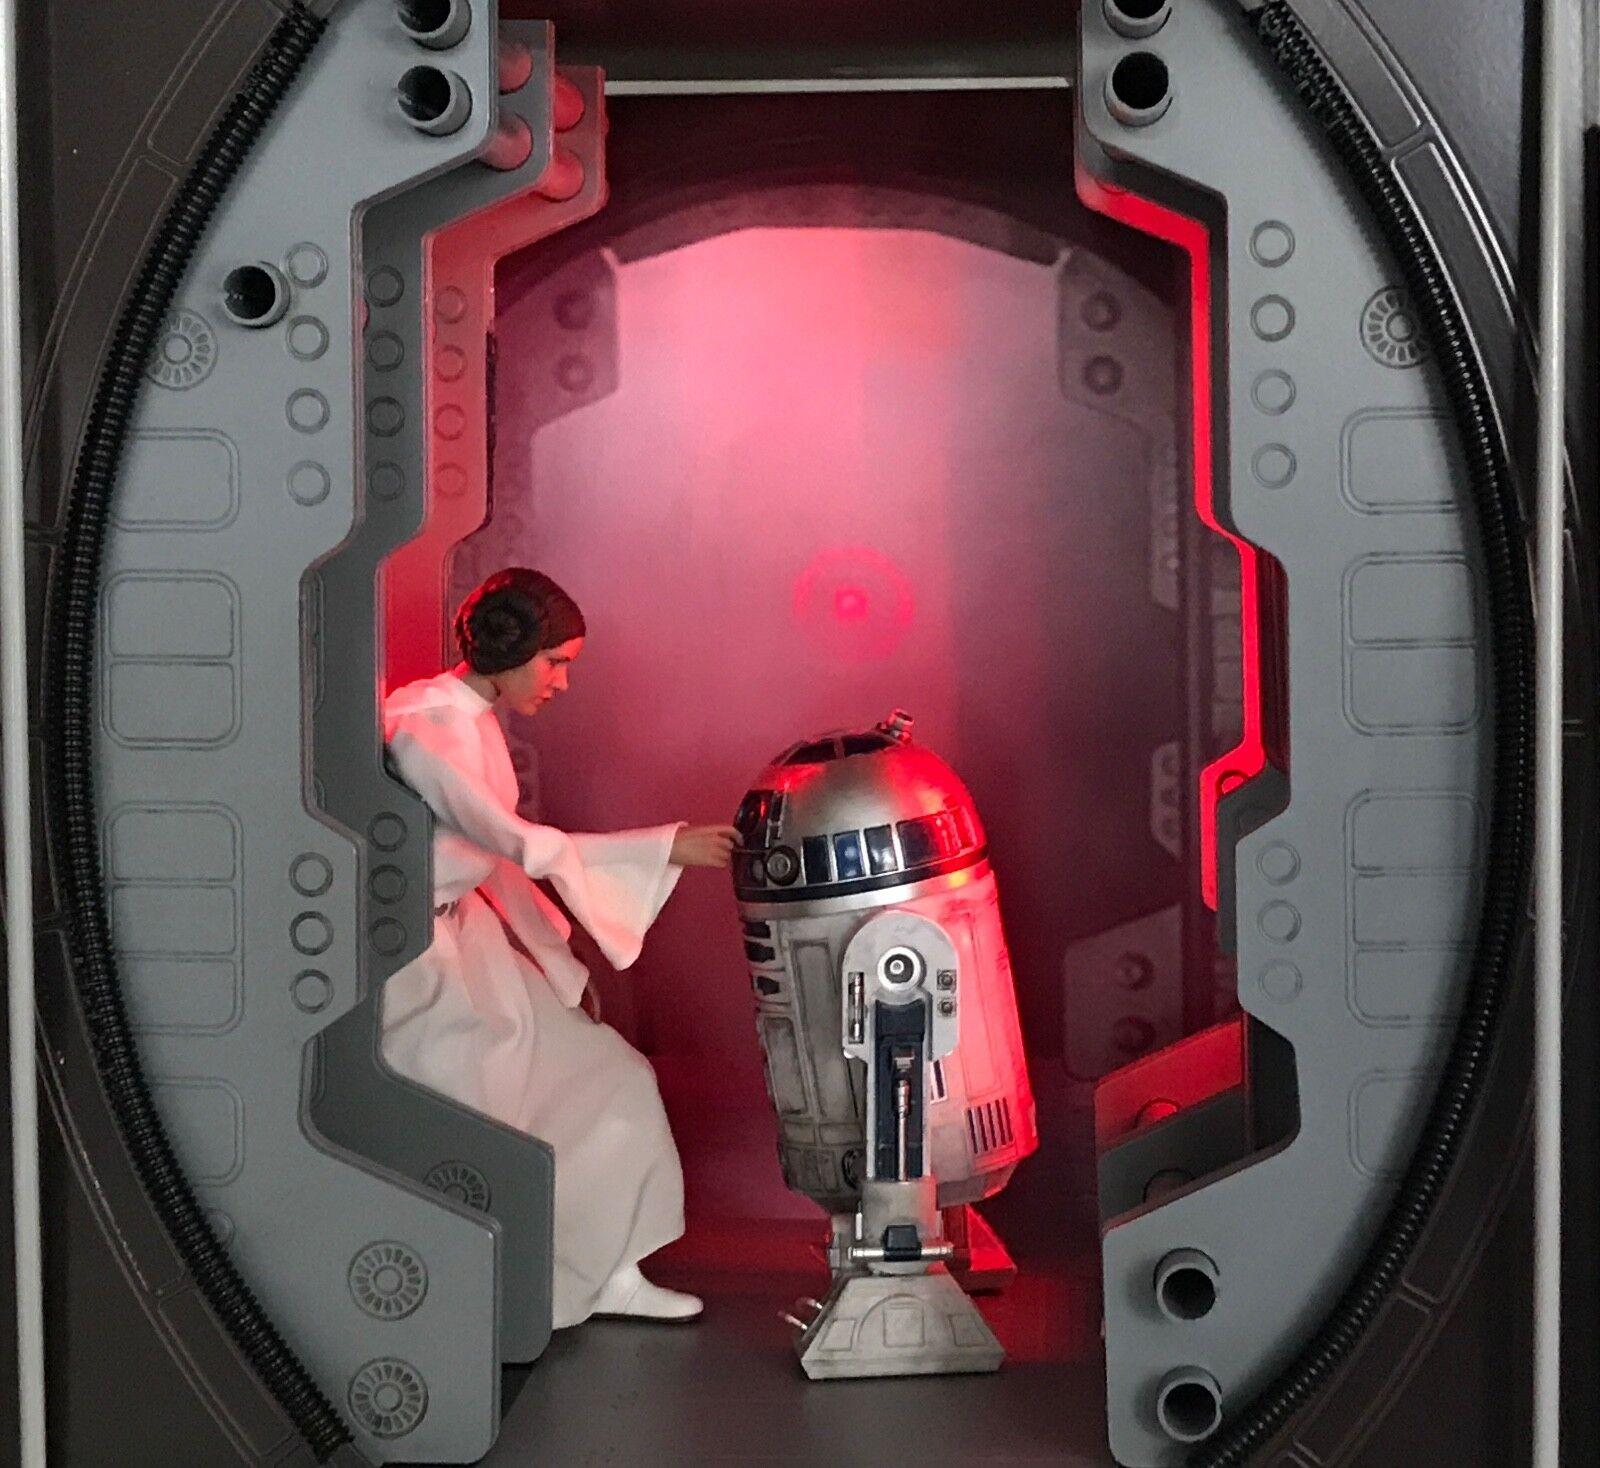 1/6 Tantive Service Corridor Diorama for Sideshow Hot Toys Princess Leia & R2-D2